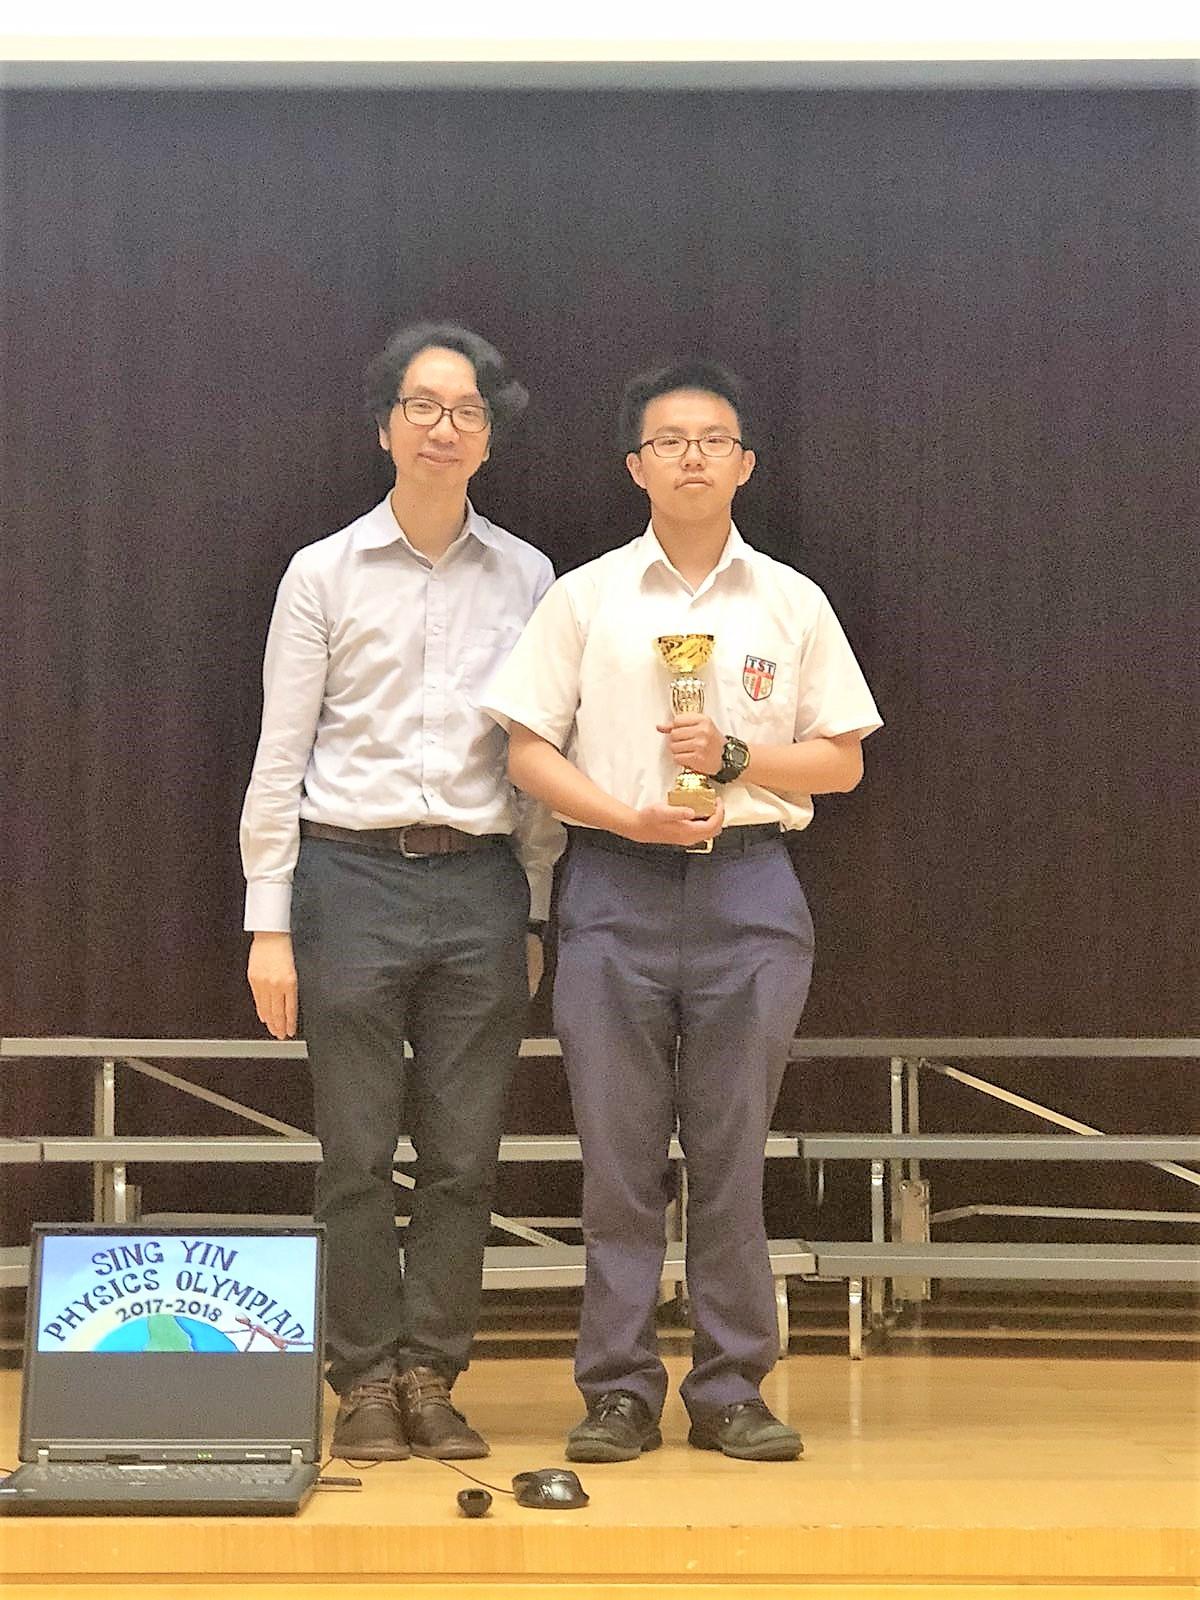 Sing Yin Physics Olympiad (2017-2018)